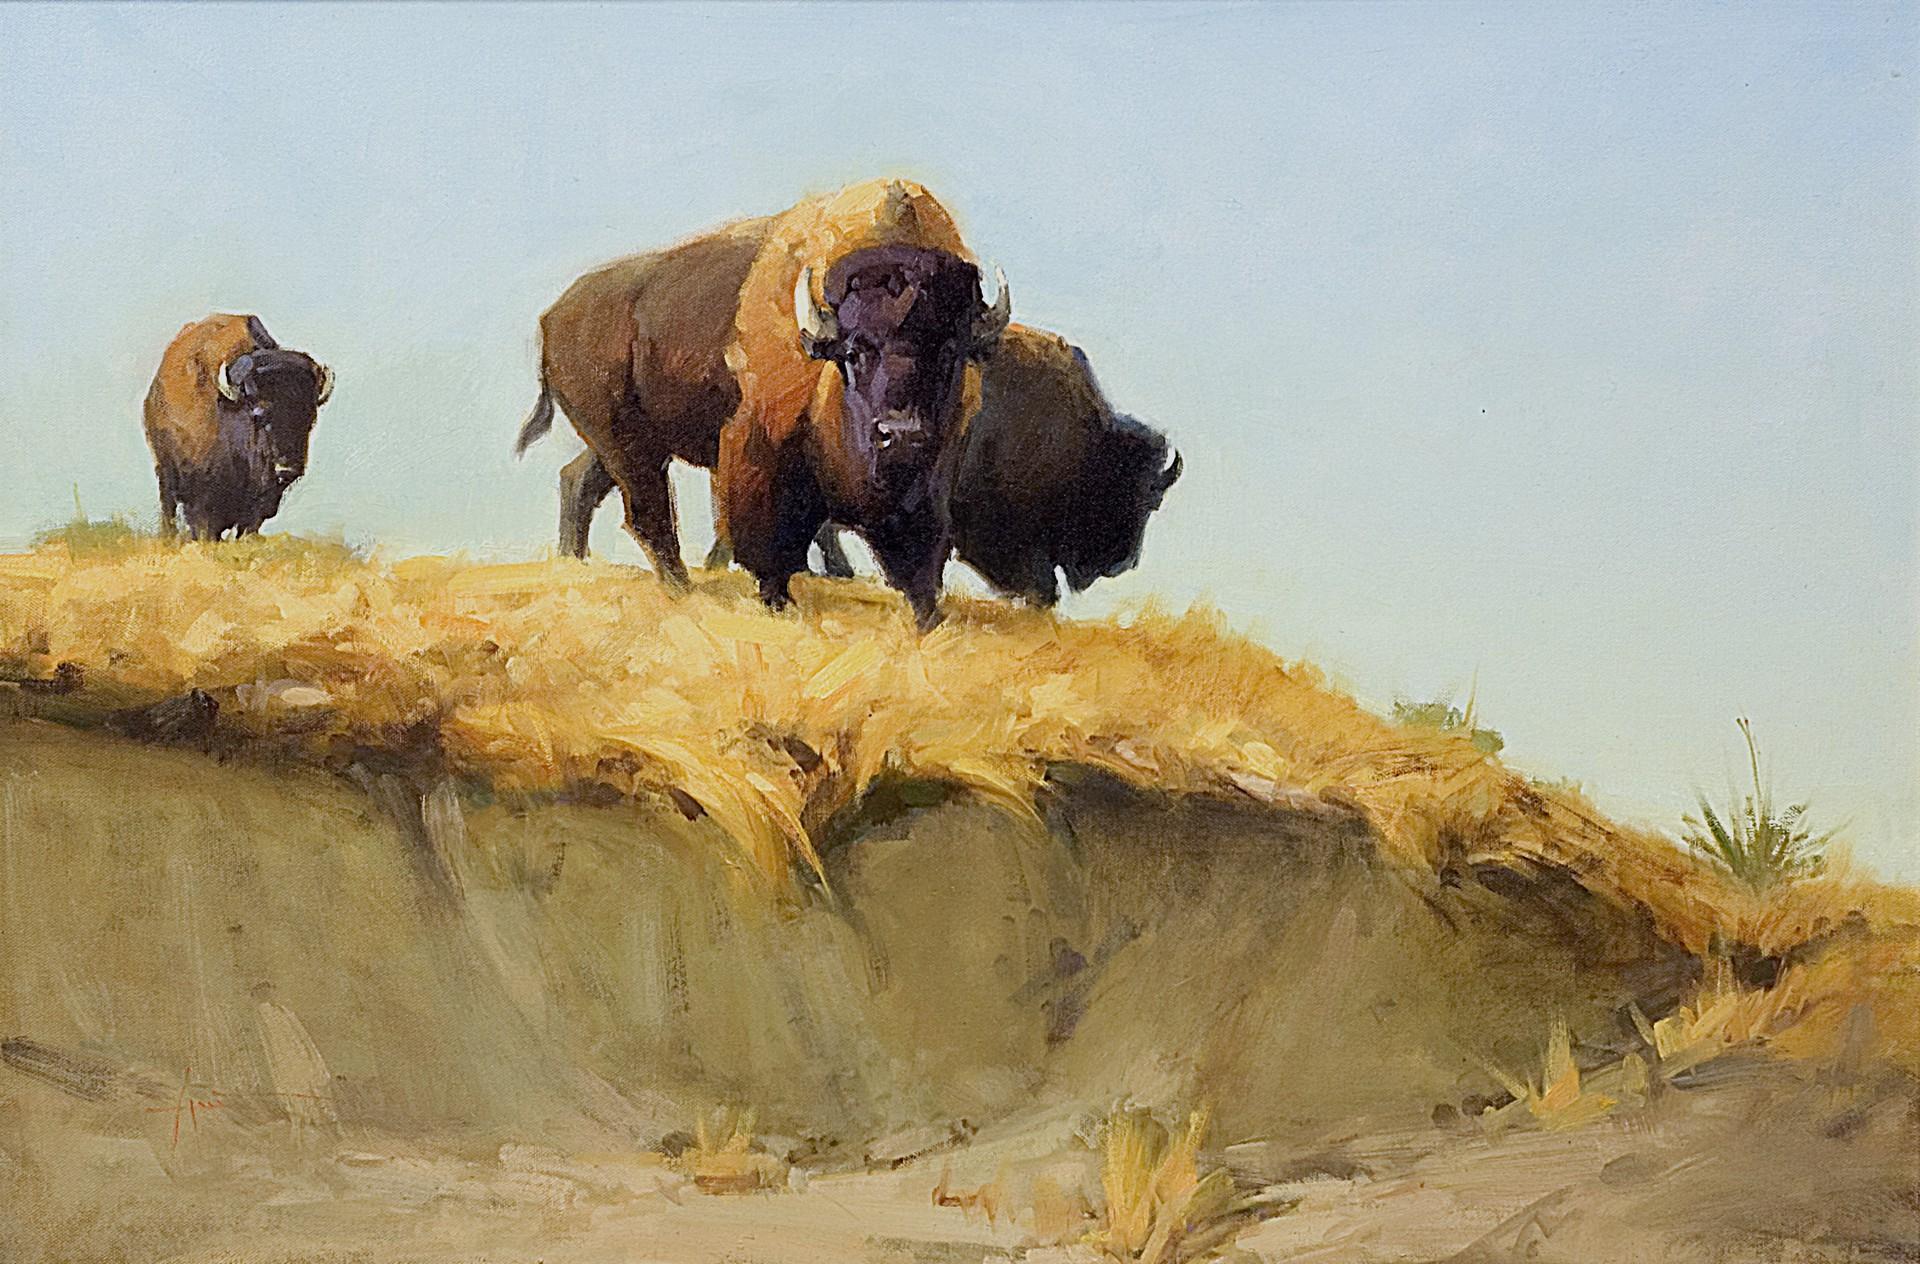 Buffalo Ridge by Lani Vlaanderen